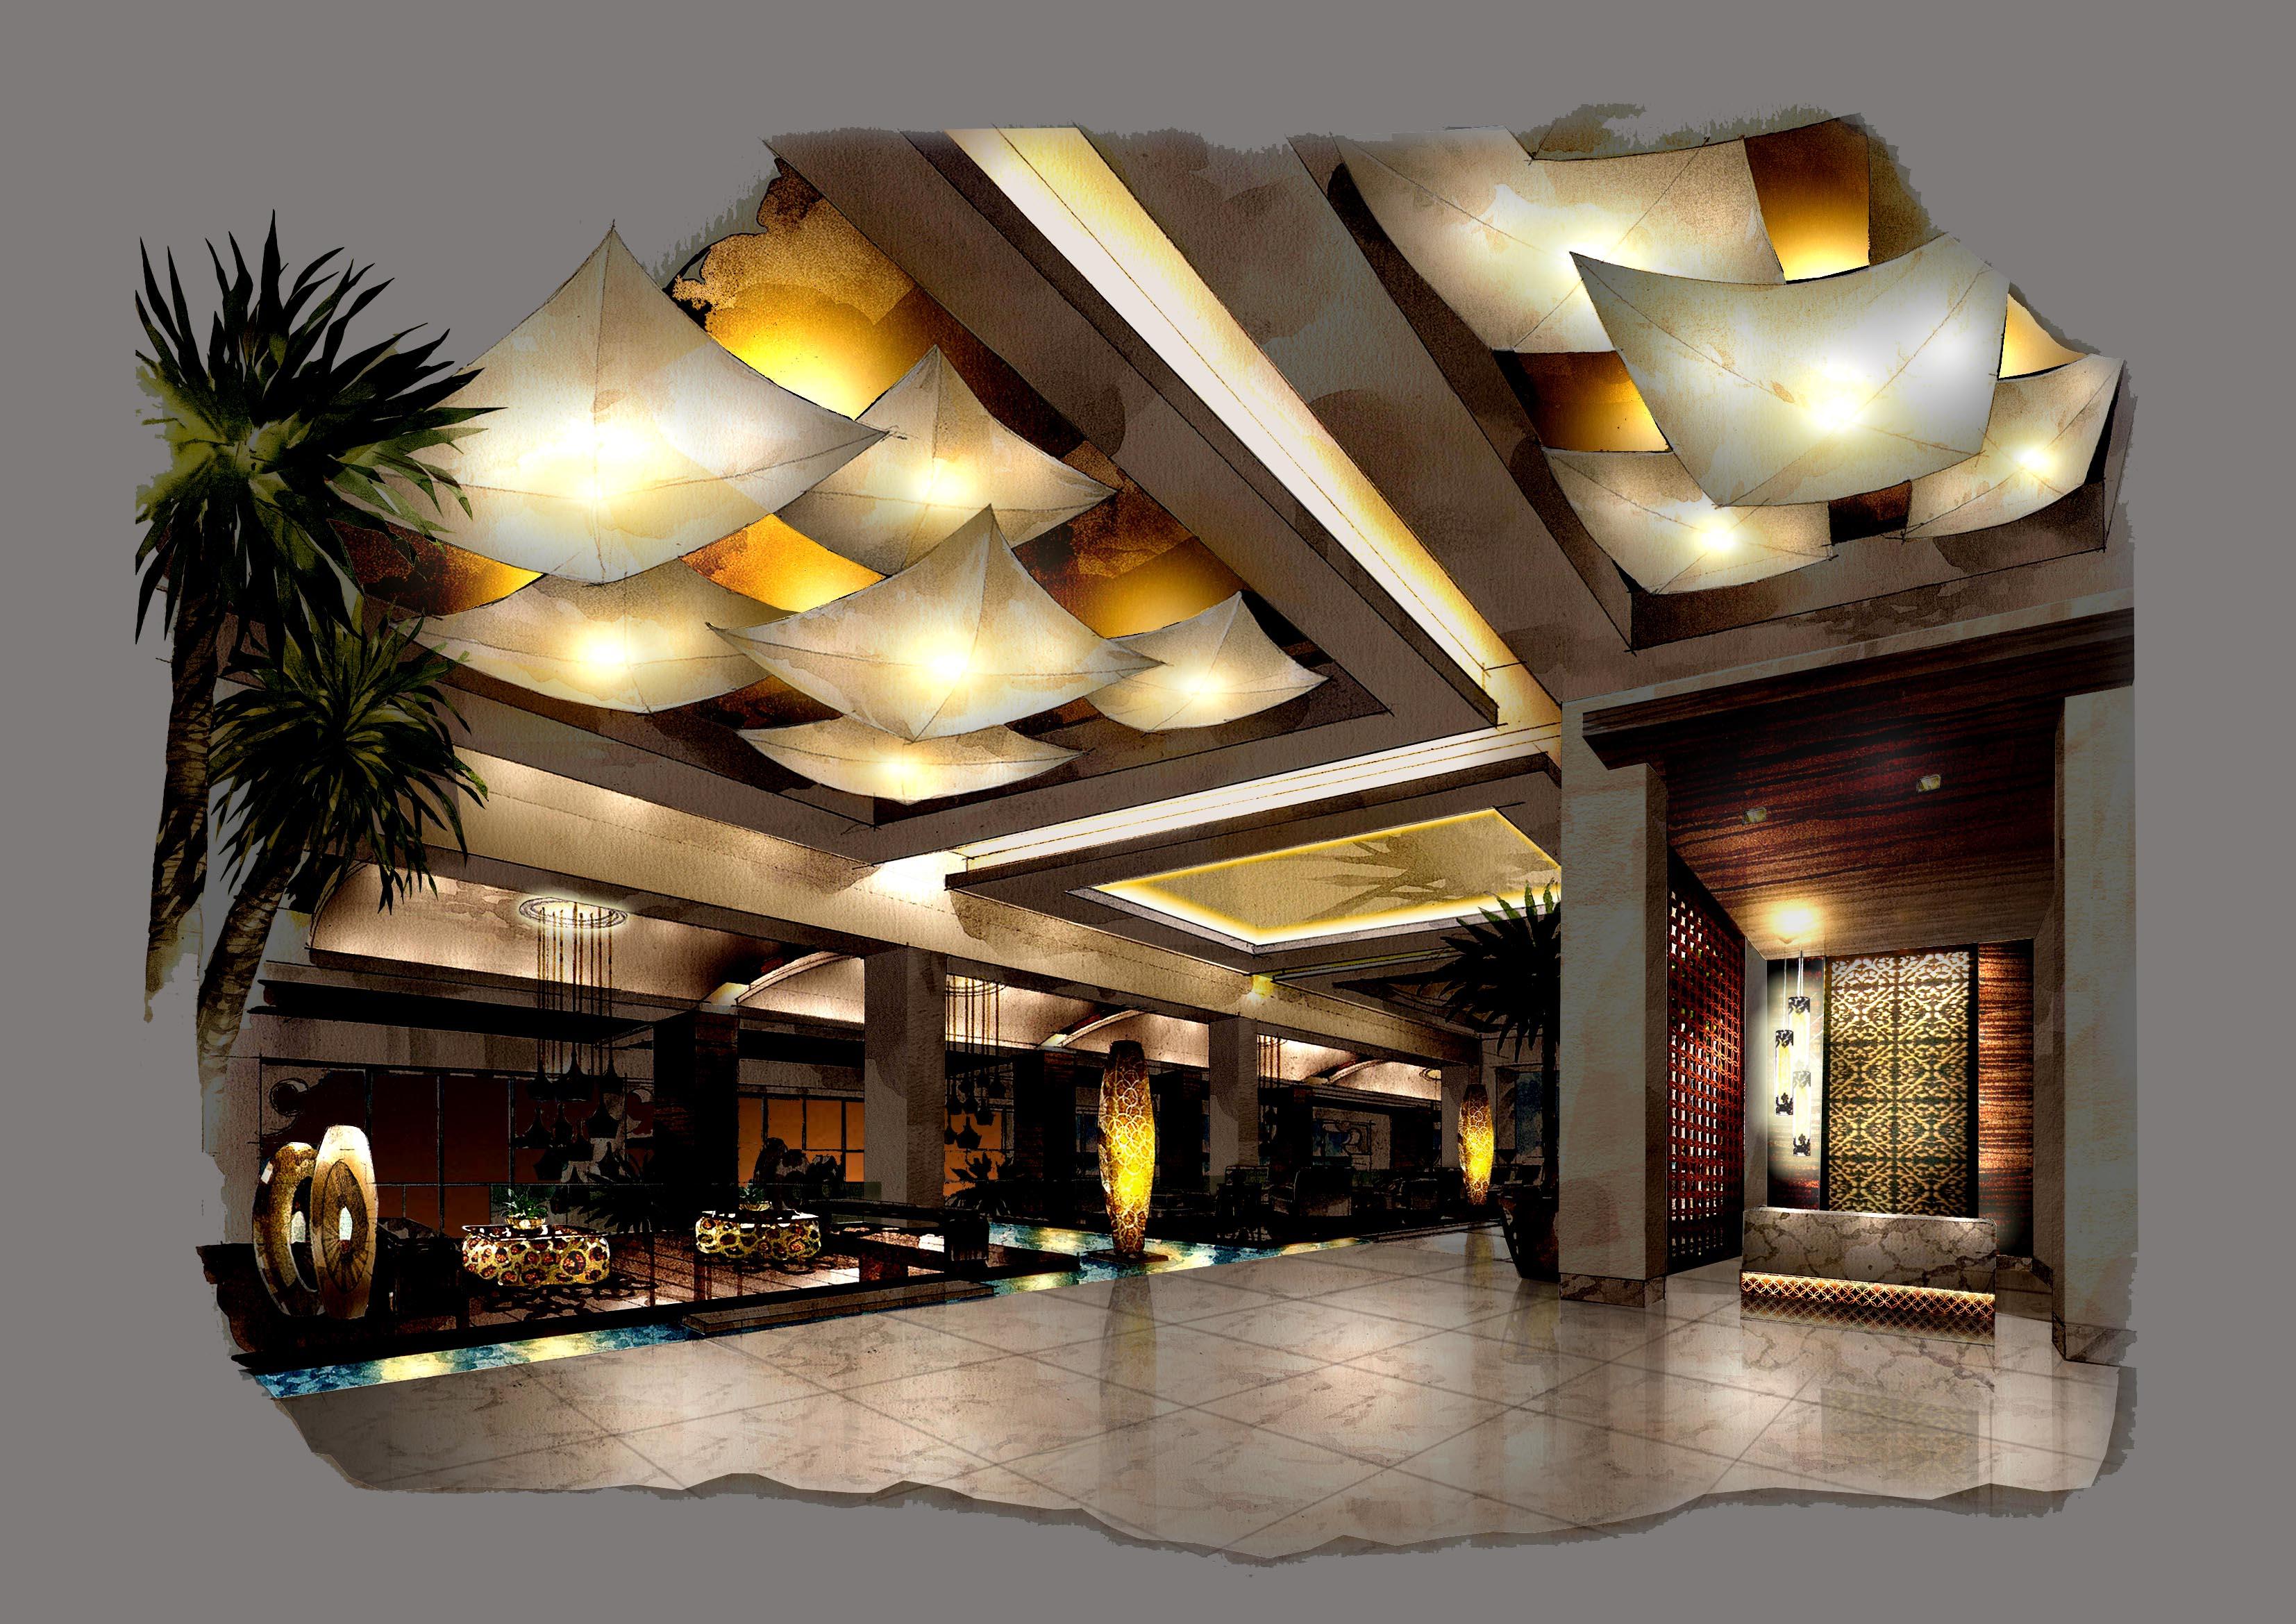 Hospitality Interior Lighting by Siddharth Mathur at Coroflotcom